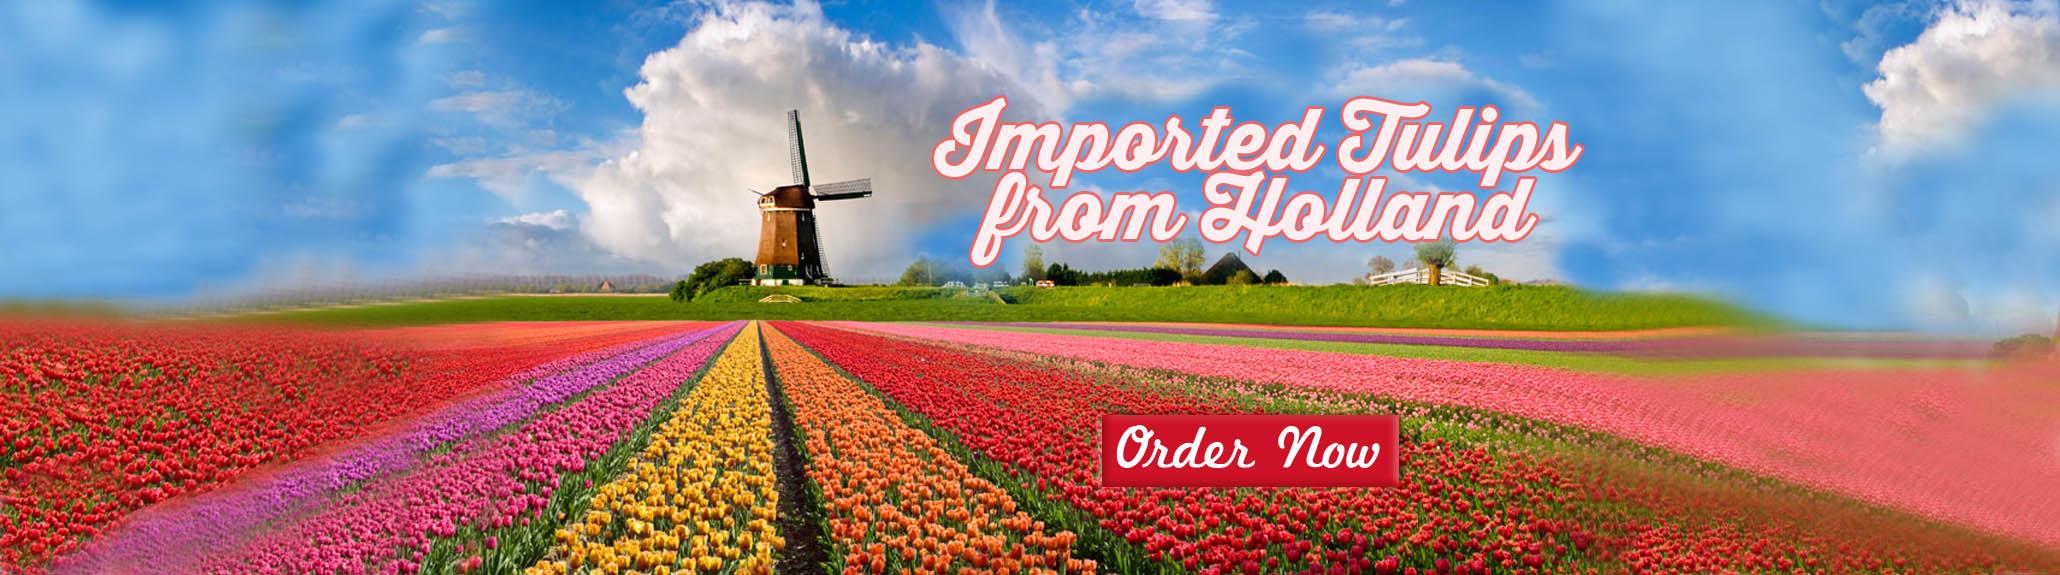 tulipsbanner-46162.jpg